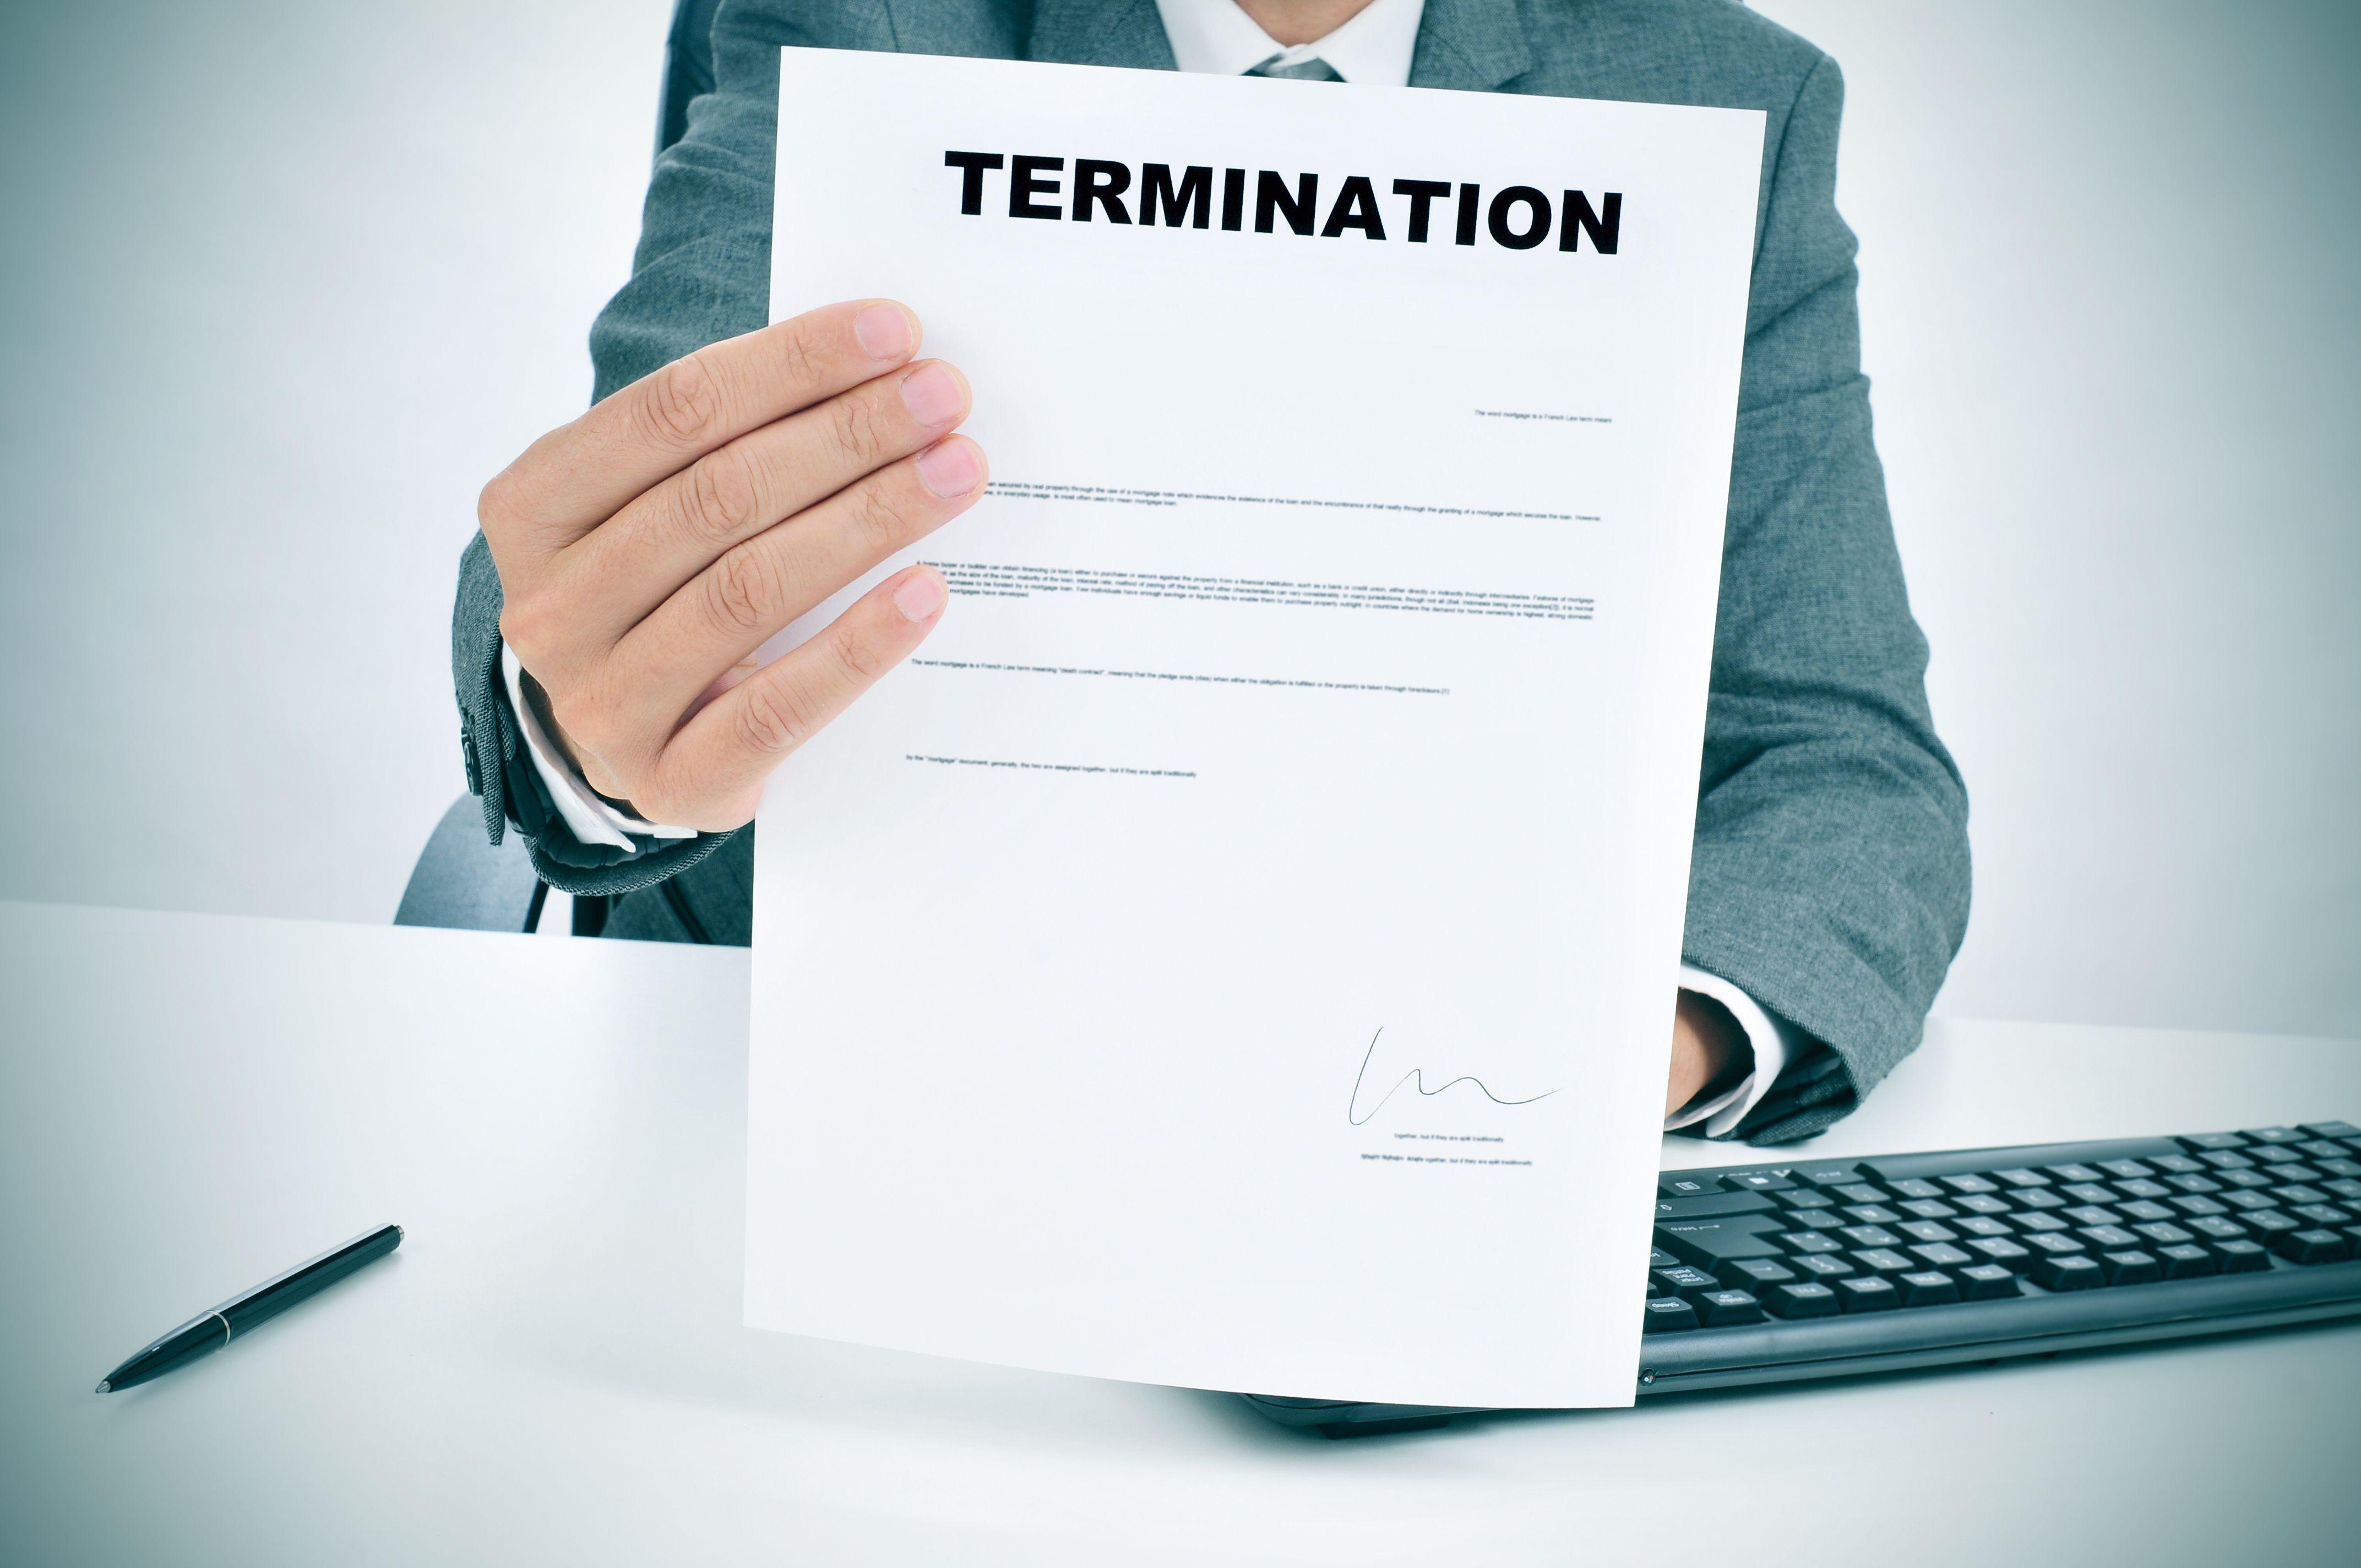 unfair dismissal Unfair dismissal的中文意思:不公平解雇,点击查查权威在线词典详细解释unfair dismissal的中文翻译,unfair dismissal的发音,音标,用法和例句等。 不公平解雇 不公正.